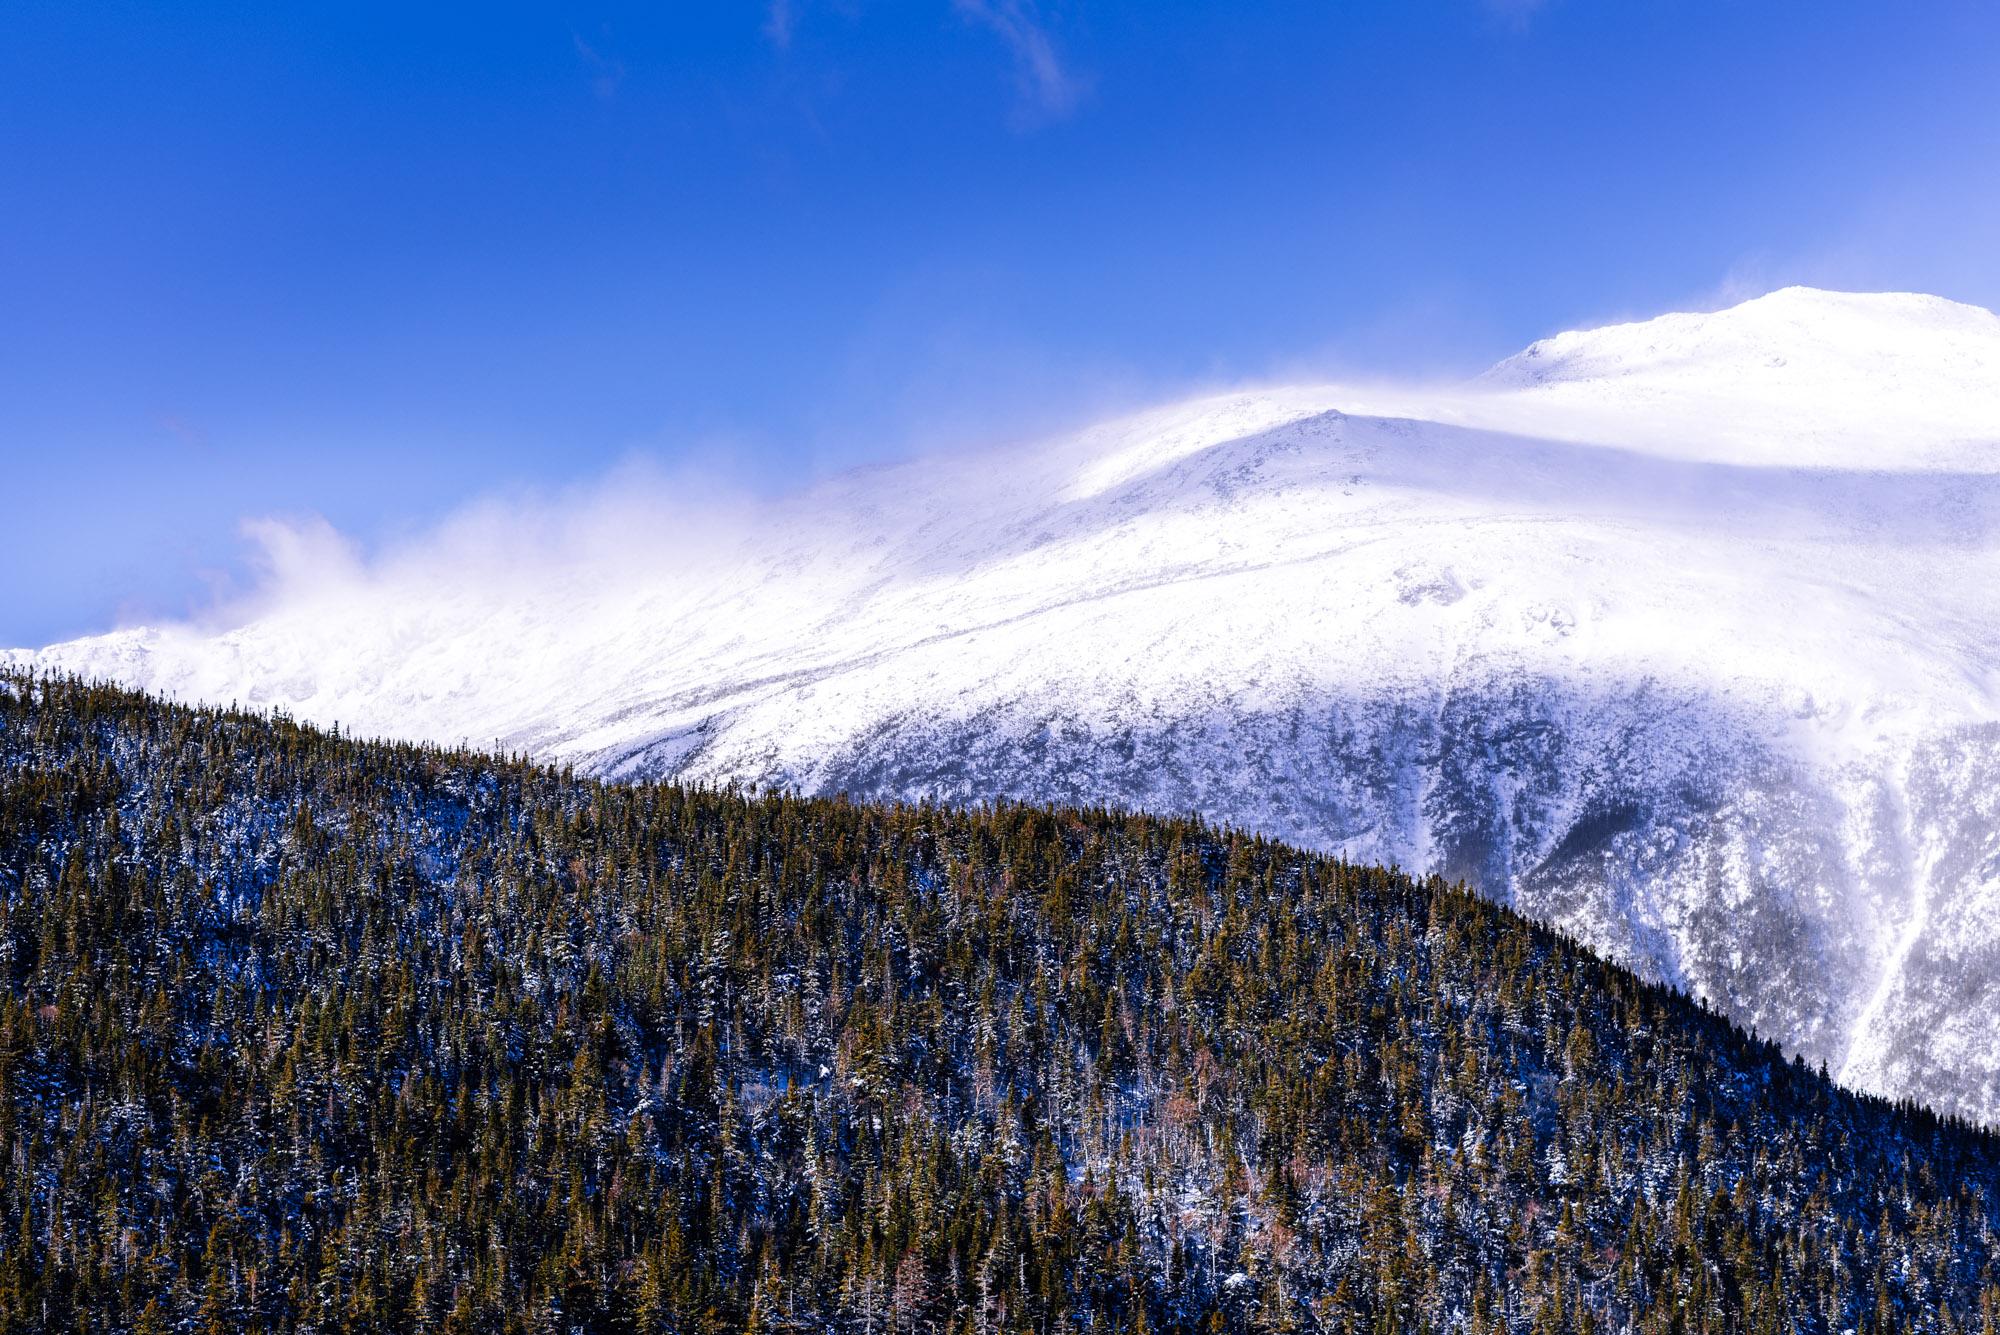 jeffontheroad-travel-new-hampshire-mount-washington-snowcoach-14.JPG